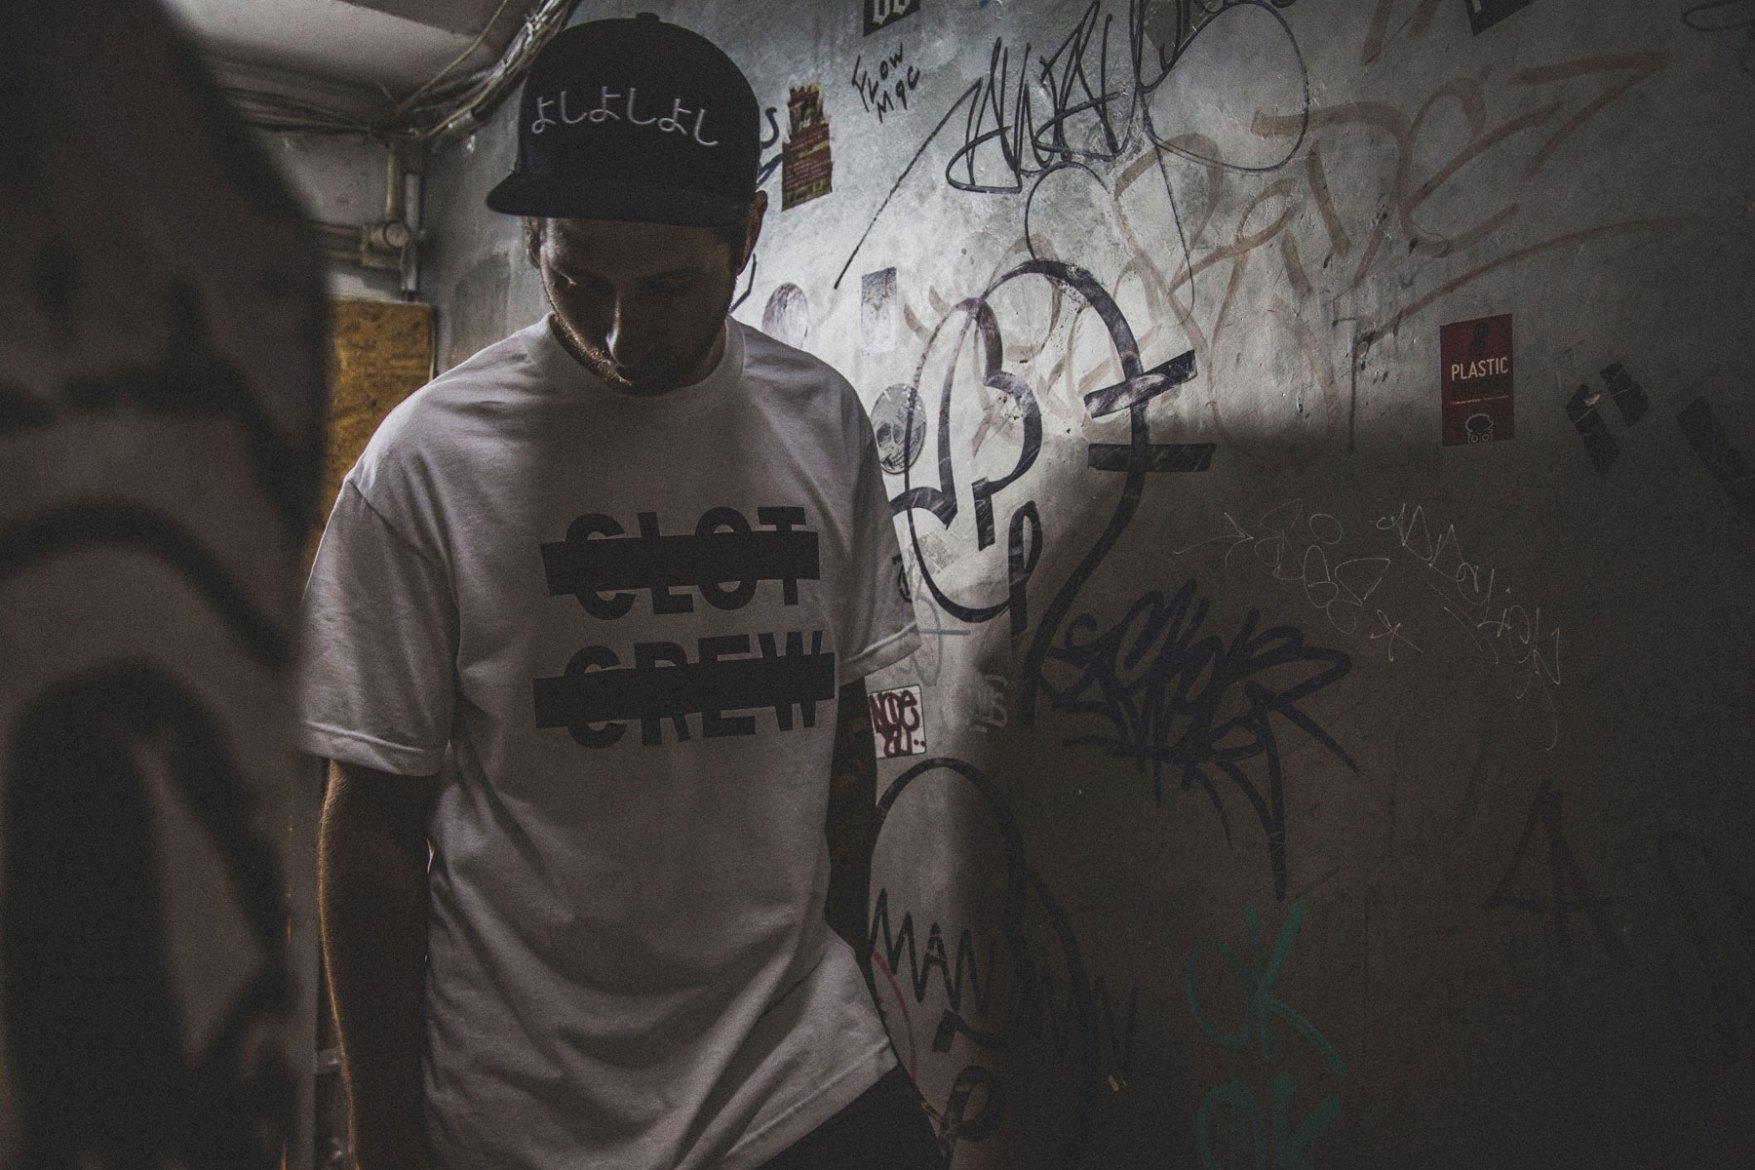 CLOT x FRANK151 2014 T-shirt Collection